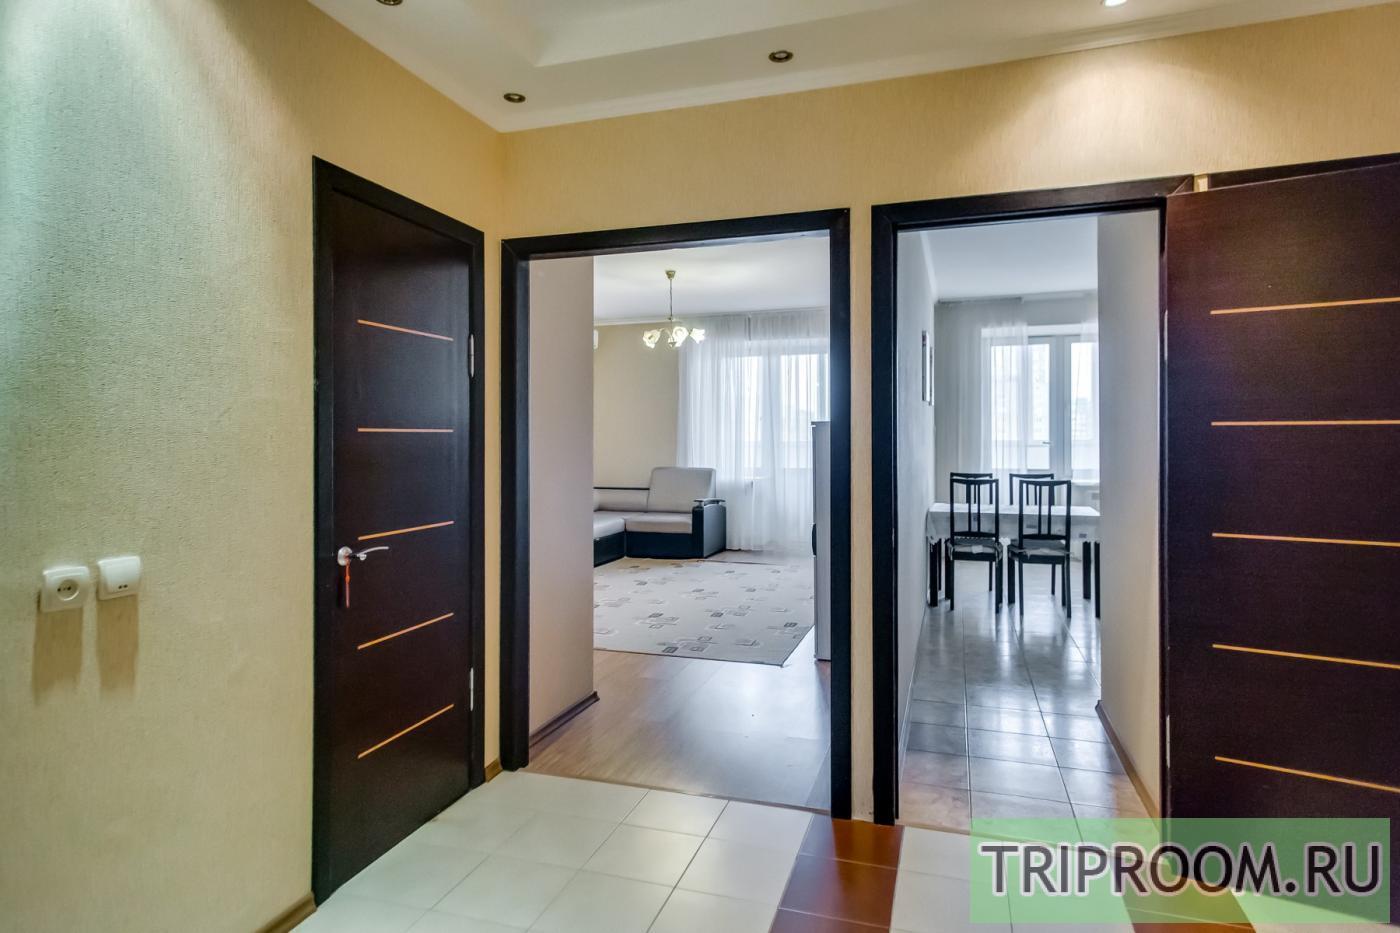 2-комнатная квартира посуточно (вариант № 23730), ул. Максима Горького улица, фото № 24